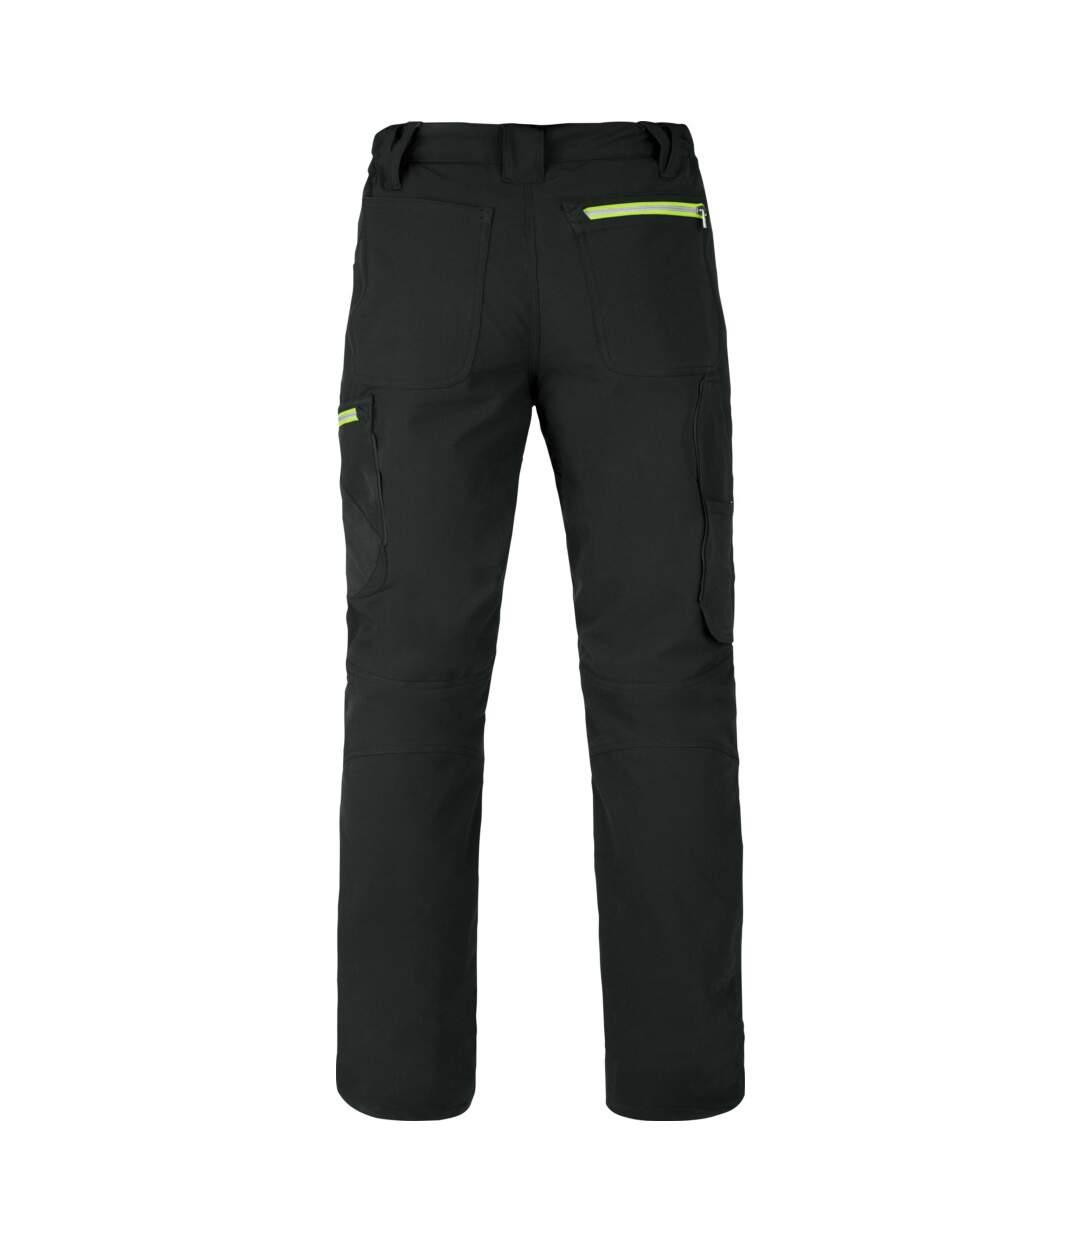 Pantalon de travail Stretch Evolution Würth MODYF Anthracite/Lime